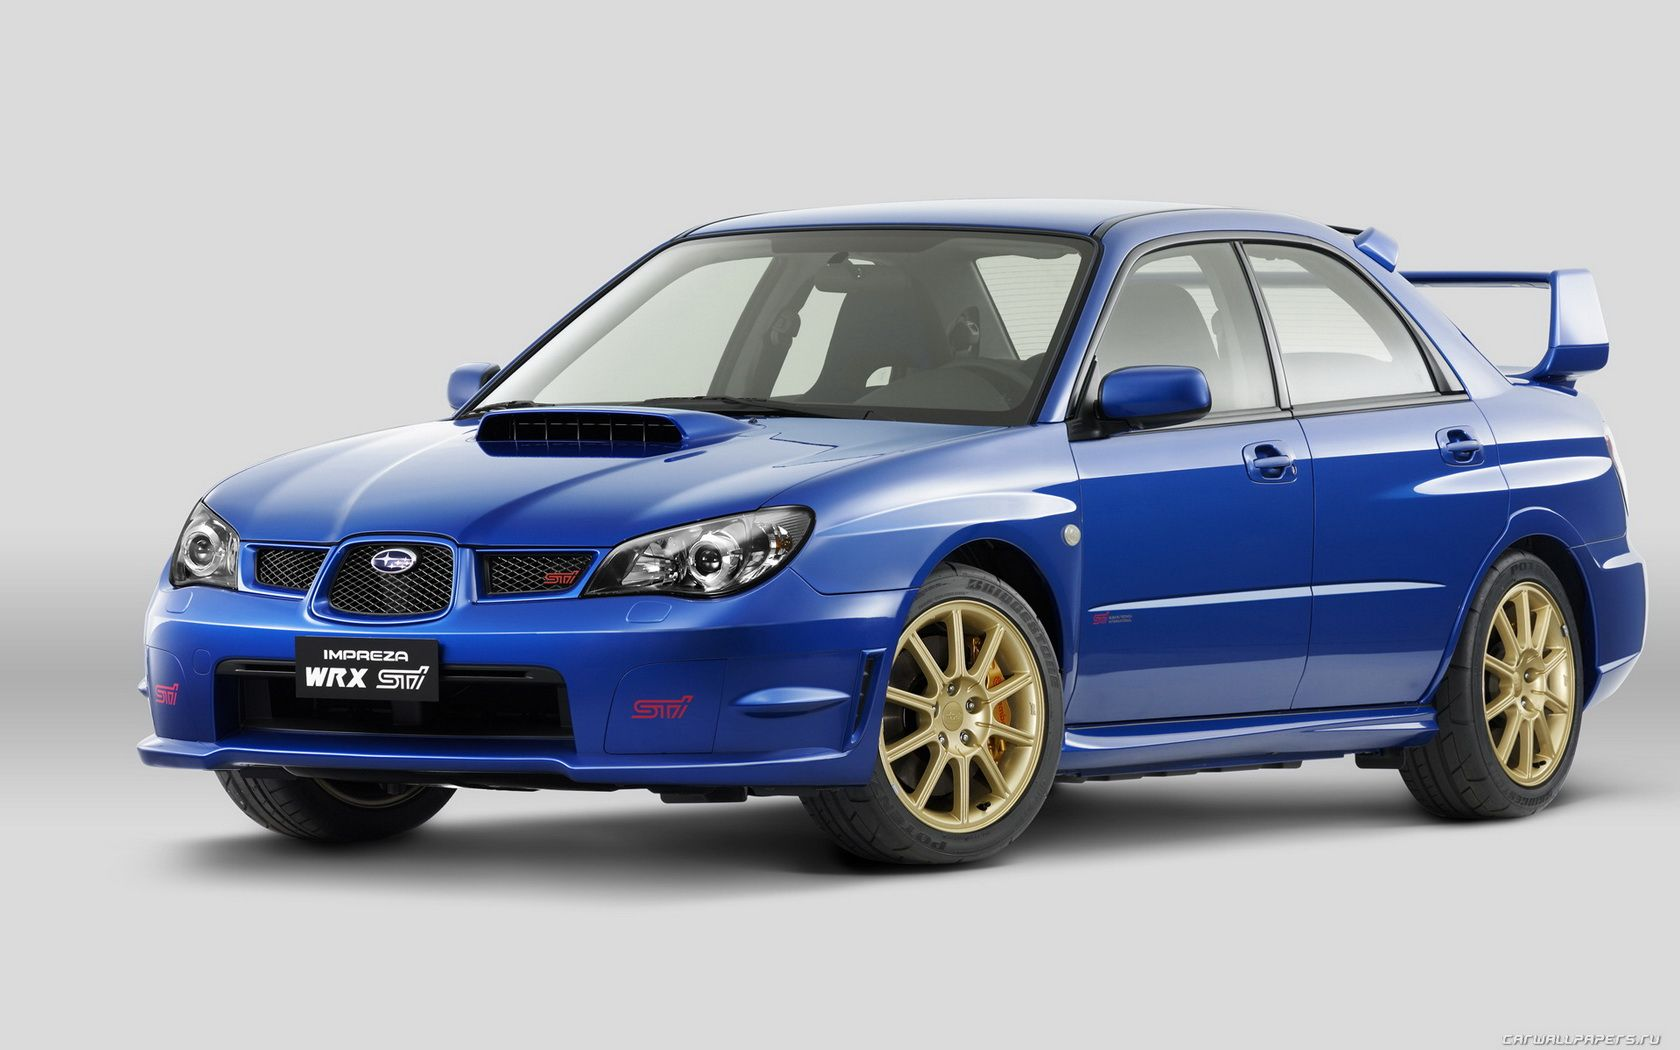 2nd Gen Subaru Wrx Sti